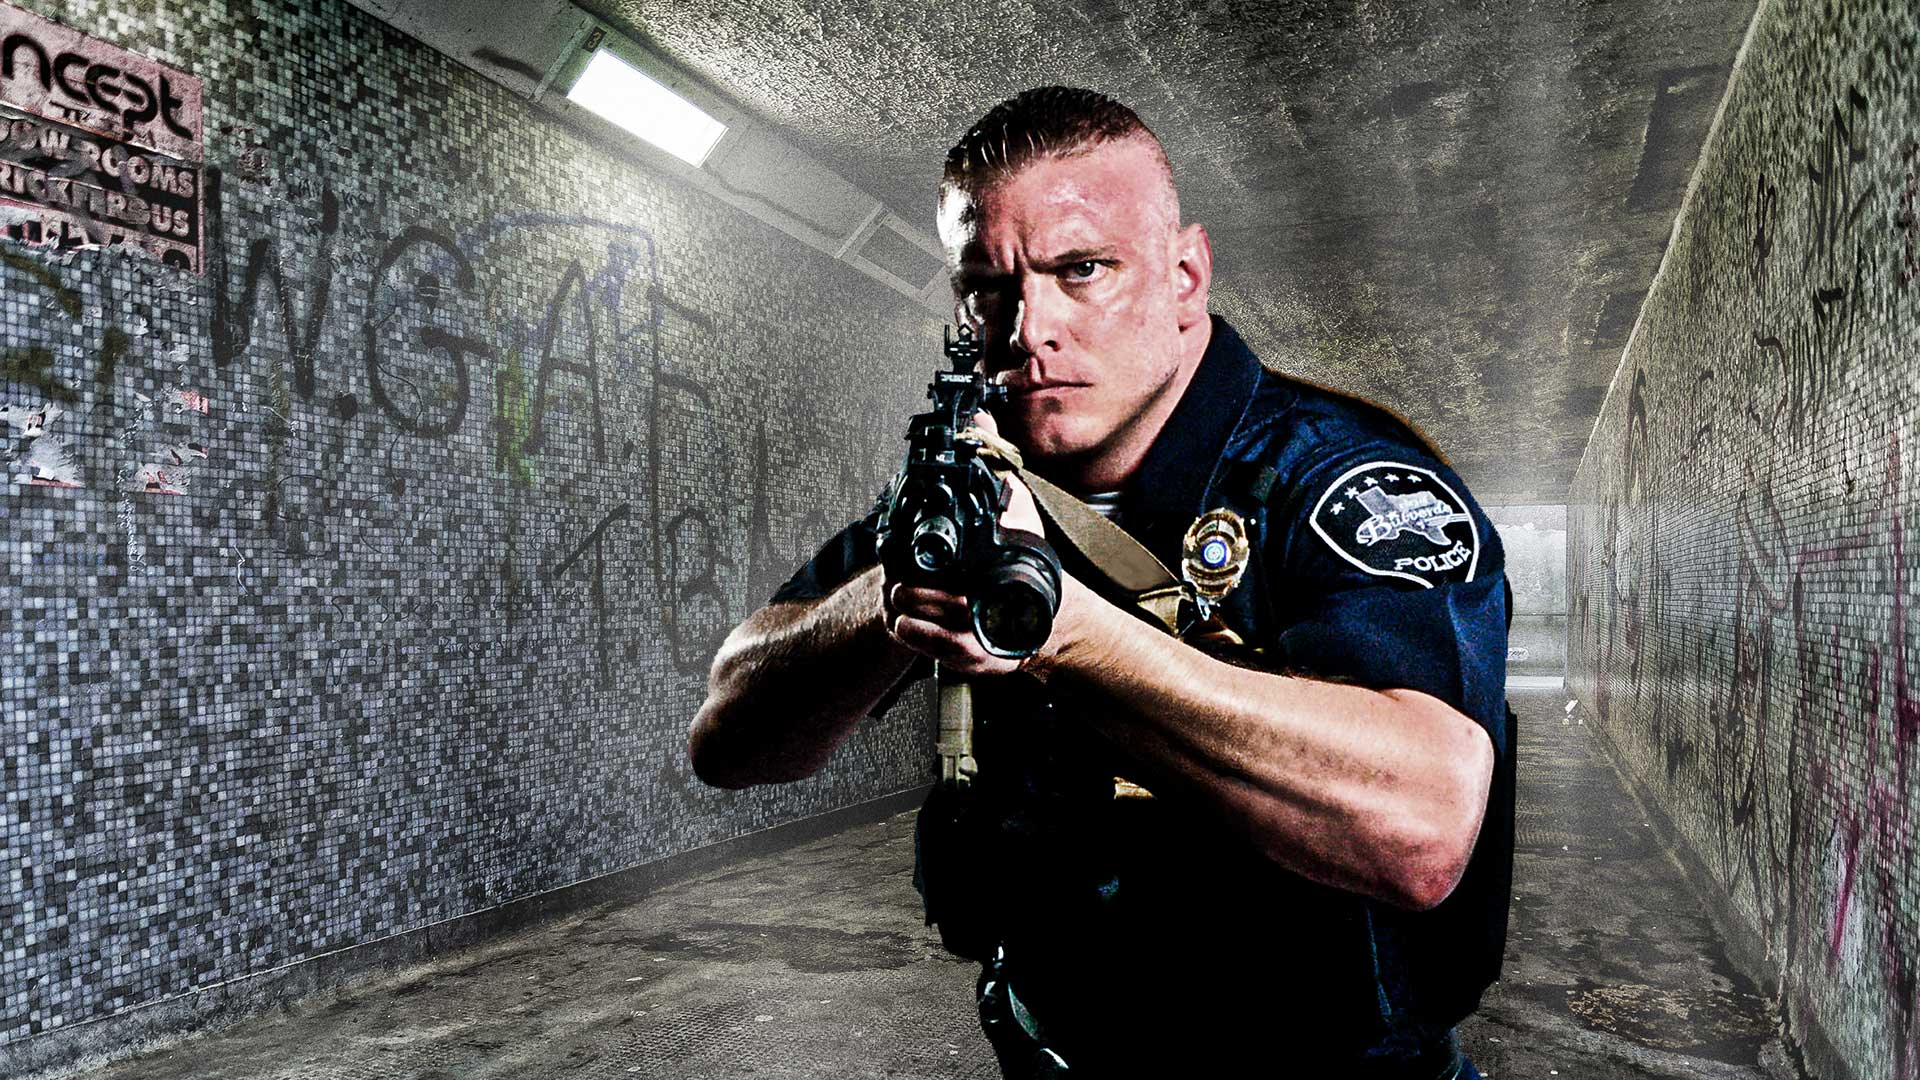 first-responder-rifle